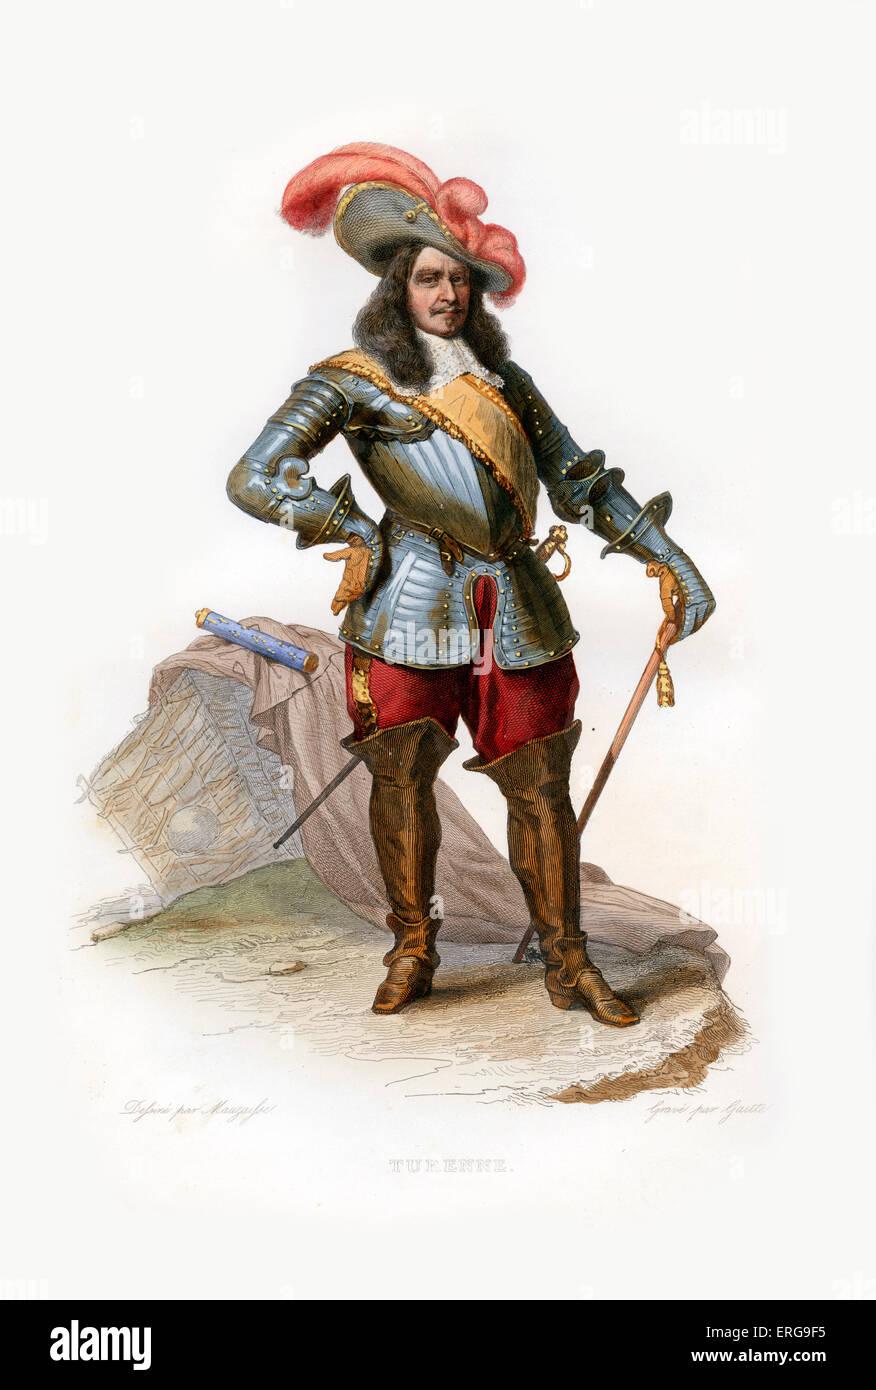 Henri de la Tour d'Auvergne, Vicomte de Turenne.  French nobleman who achieved military fame and became a Marshal - Stock Image